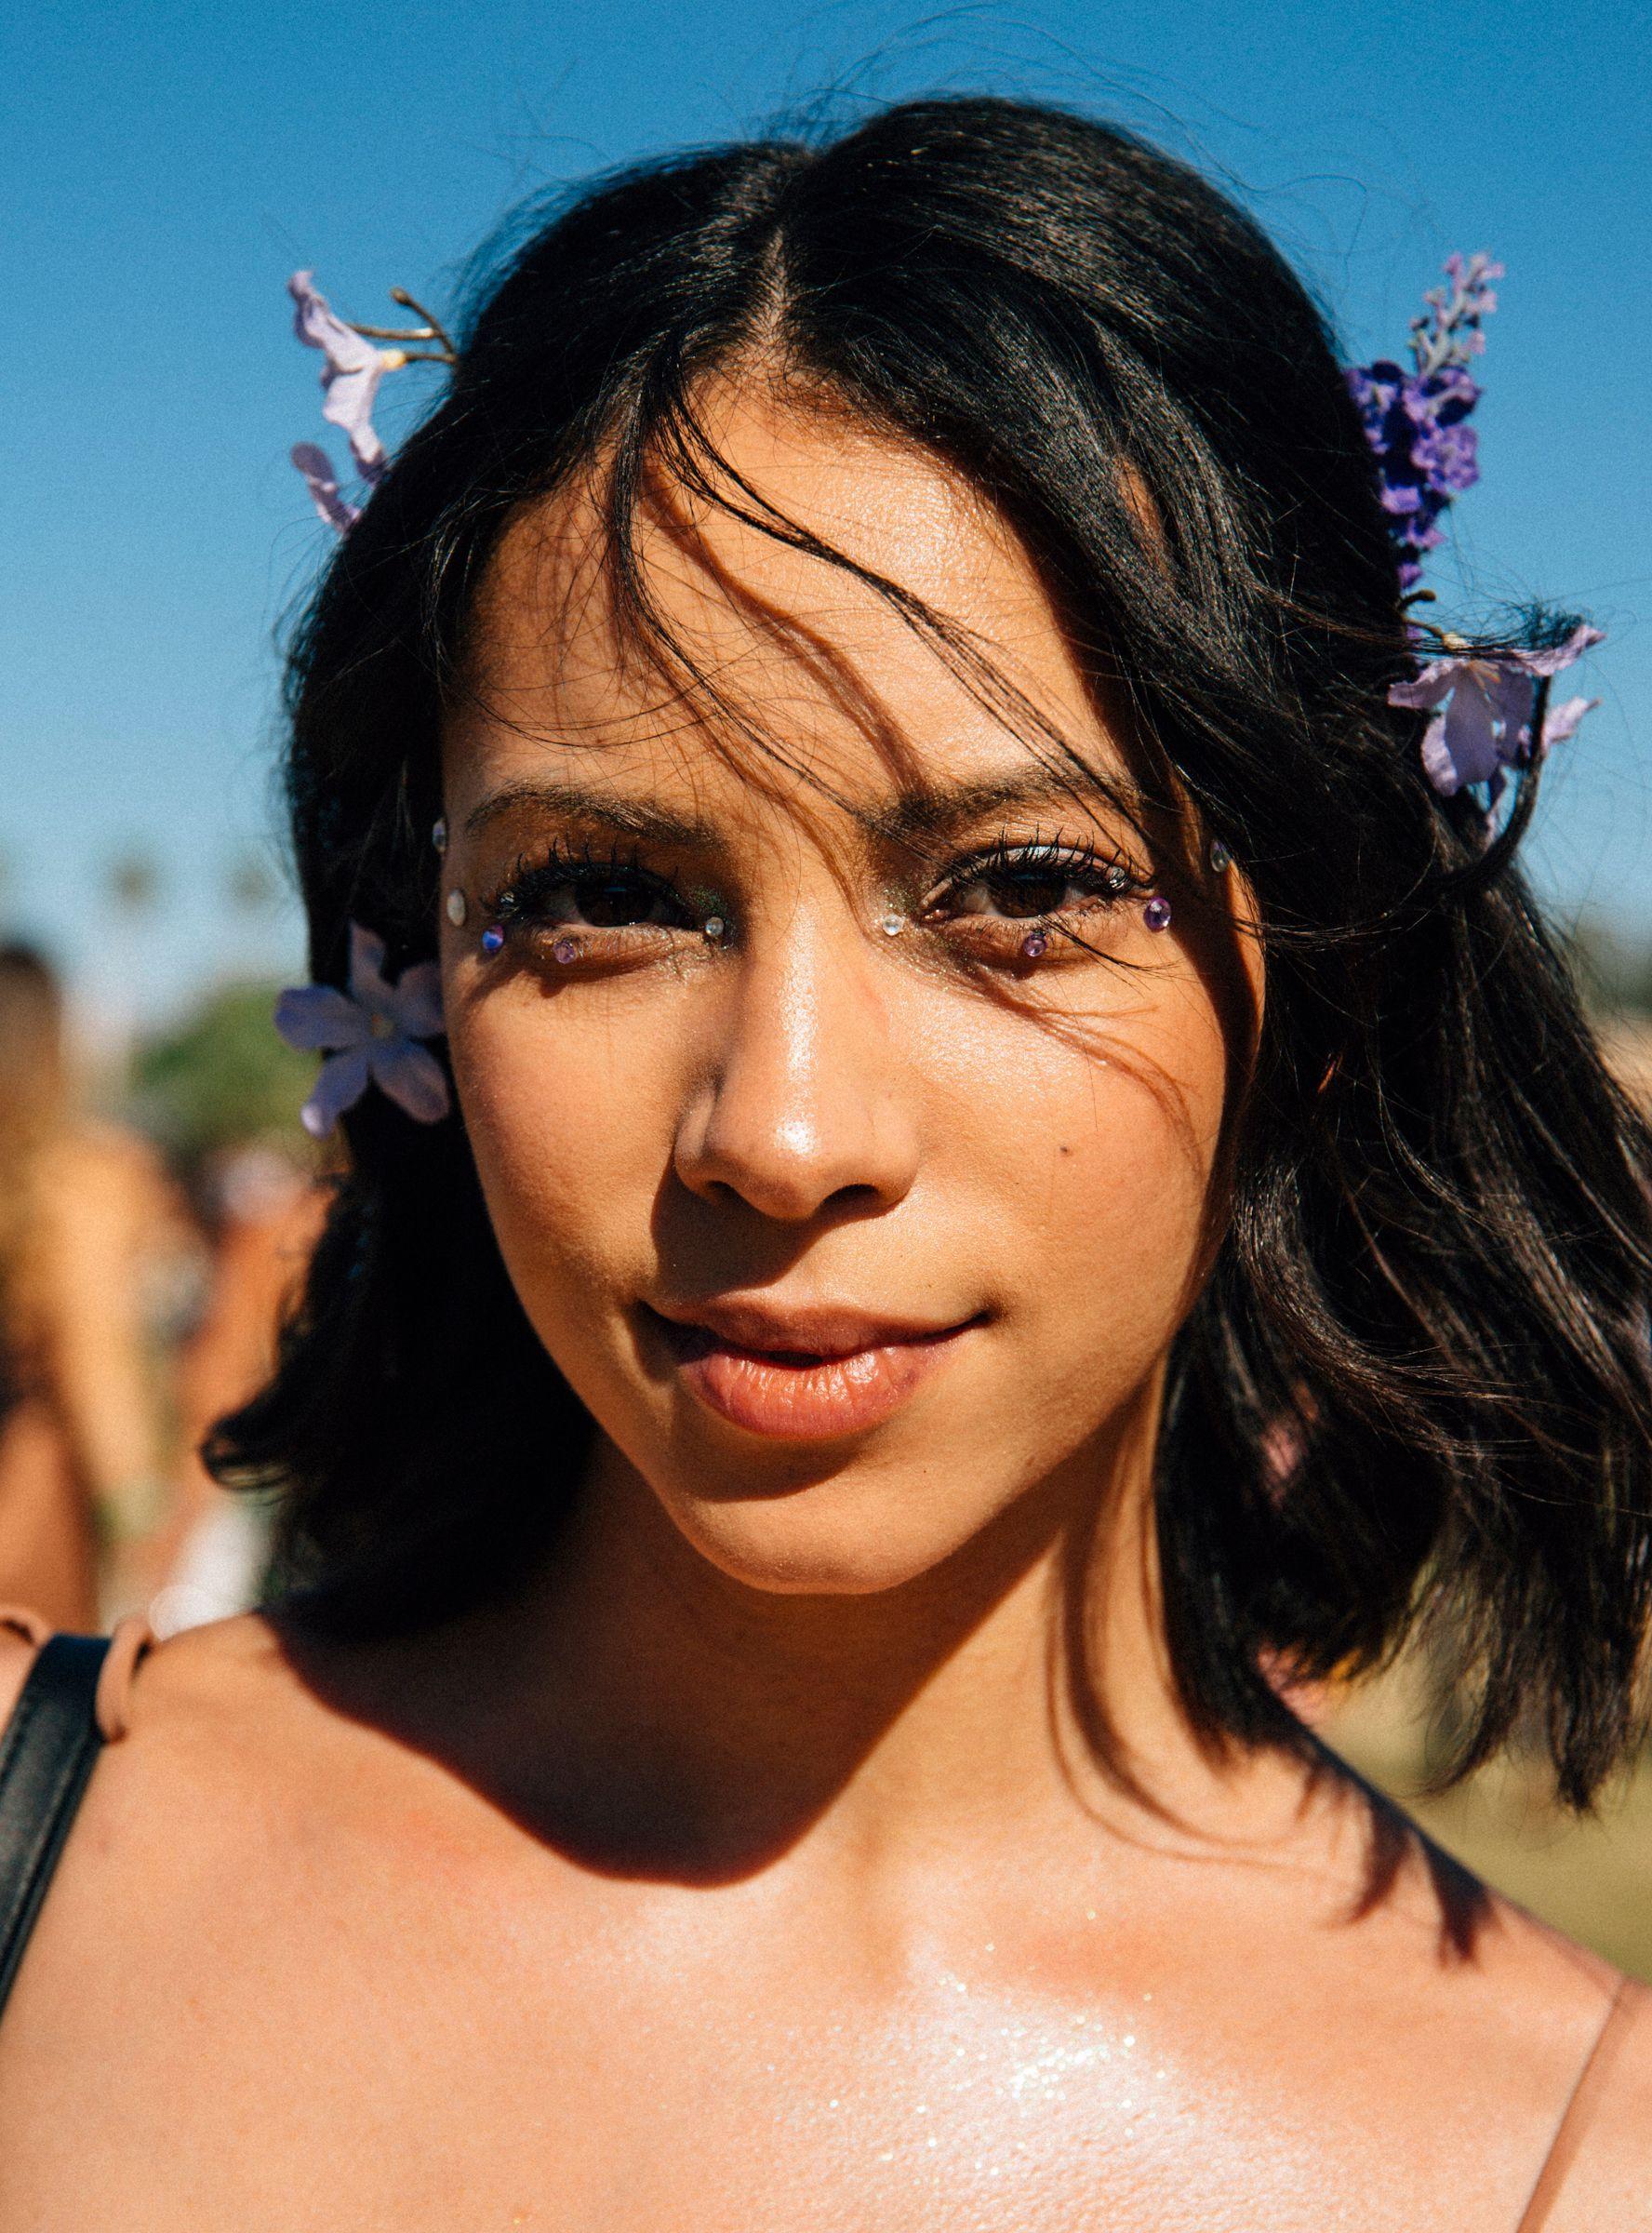 Coachella's Biggest Makeup Trend? Glitter, Glitter, & More